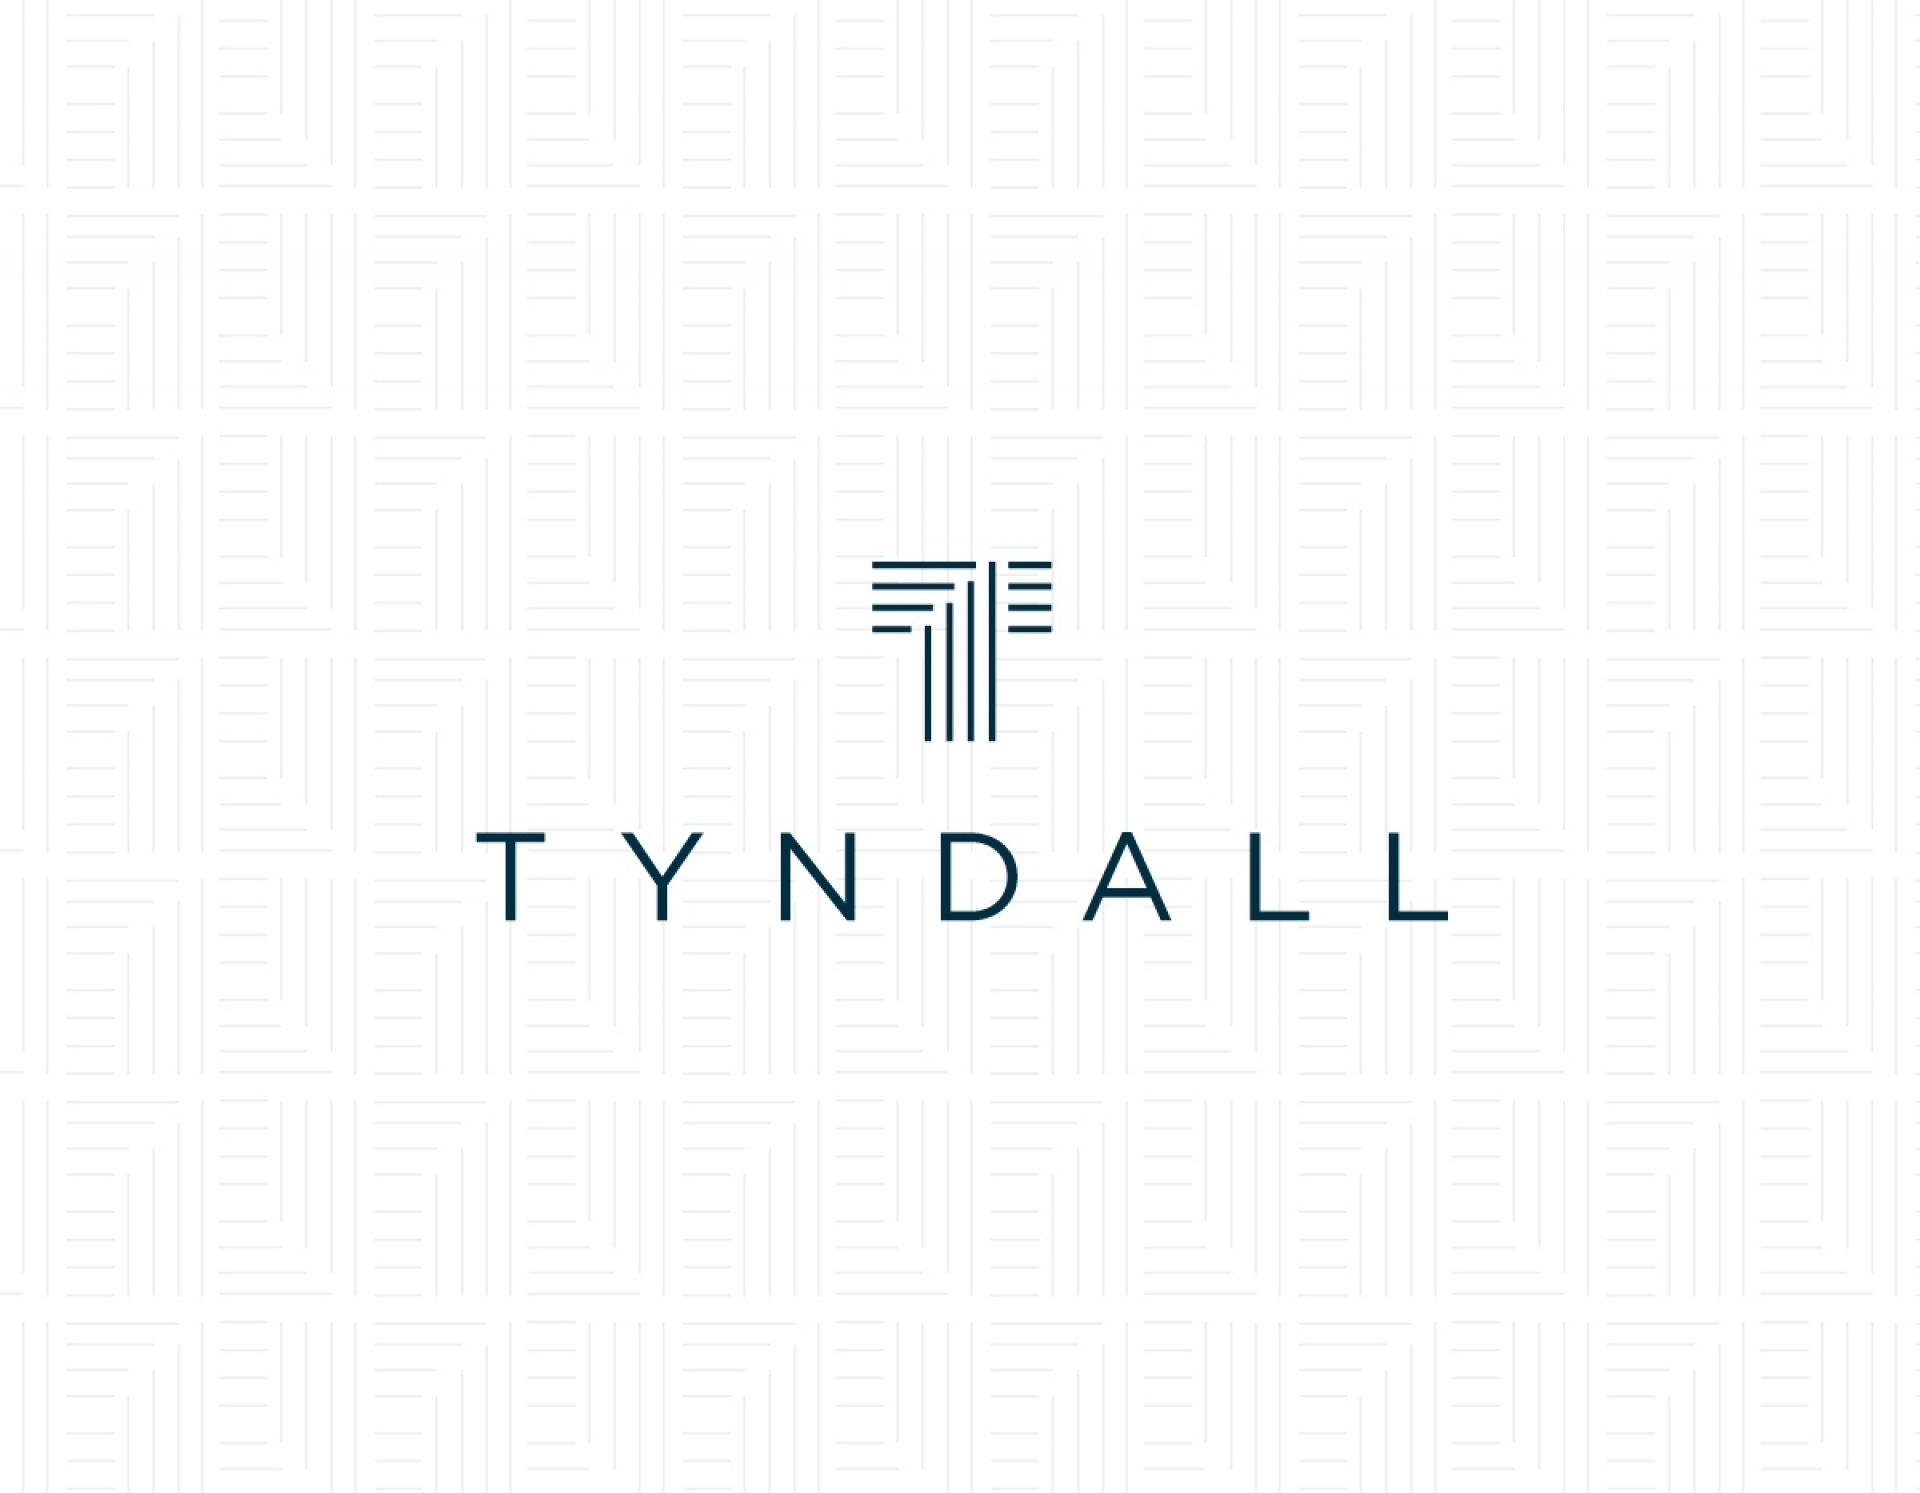 Tyndall 1 10